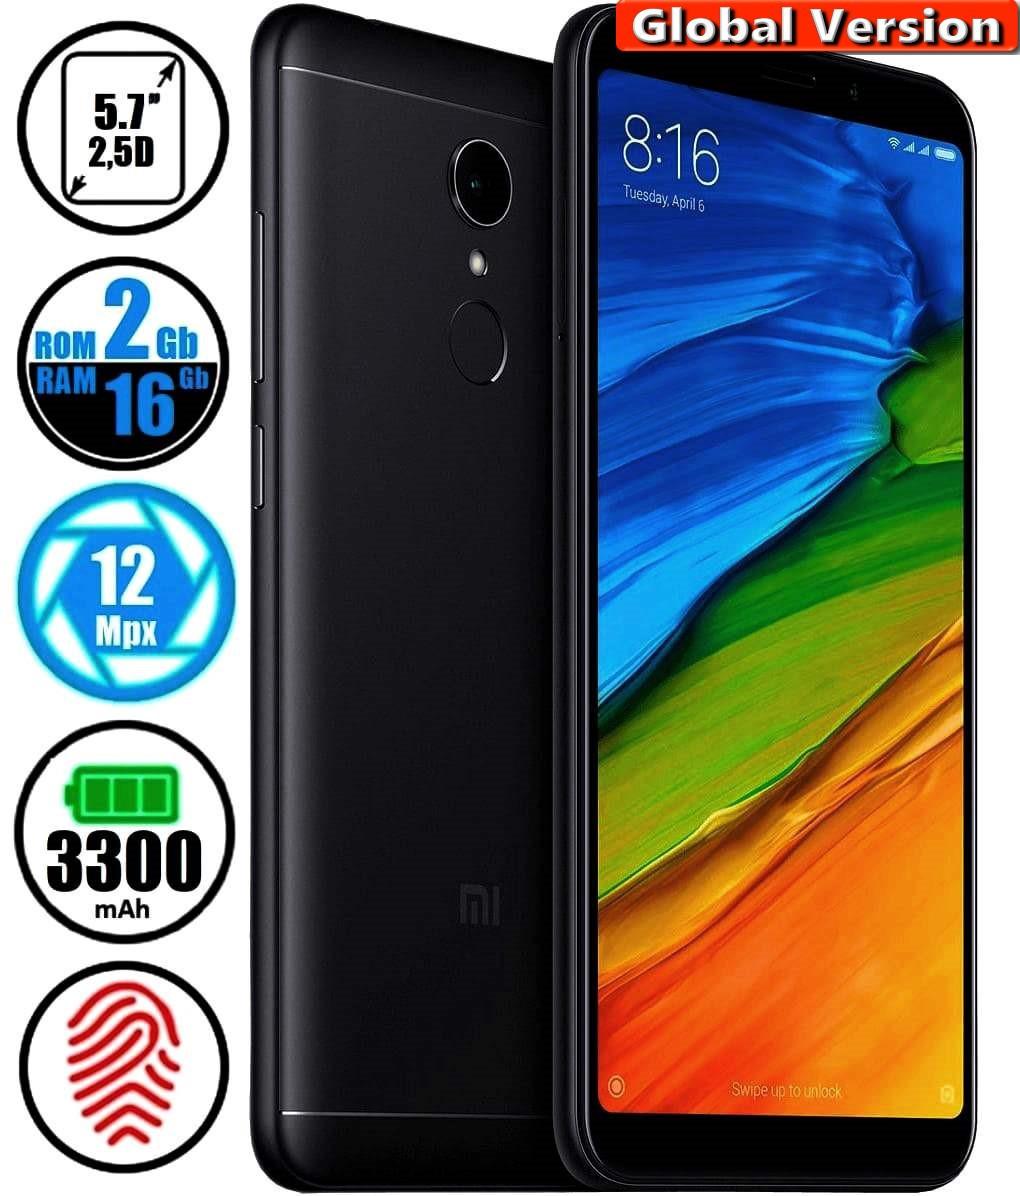 Смартфон Xiaomi Redmi 5 2/16Gb Black (Global Version) + Подарок Защитное Стекло